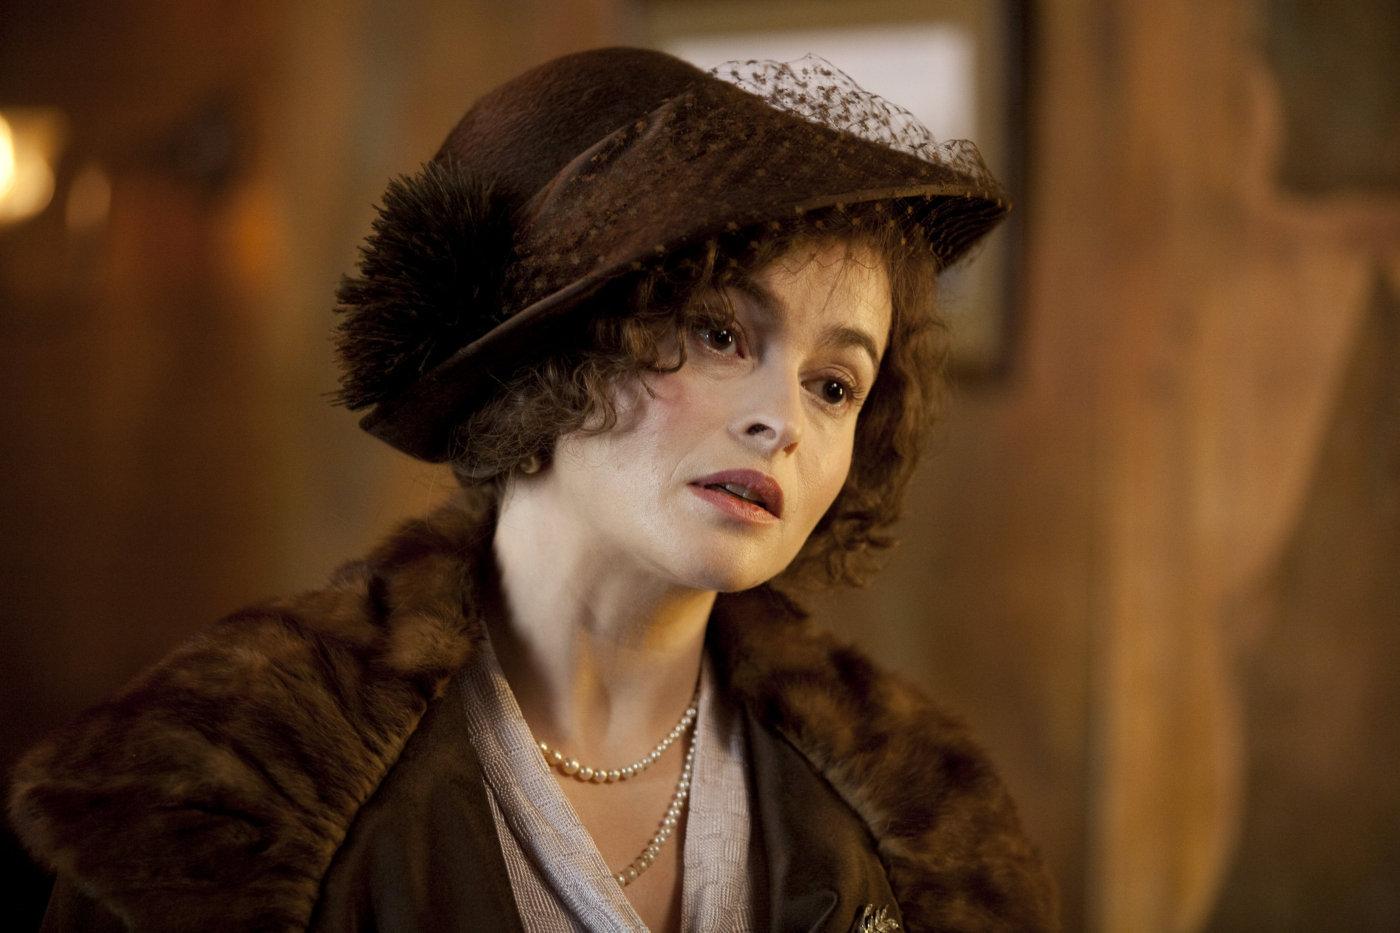 The Jane Austen Film C... Helena Bonham Carter Movies